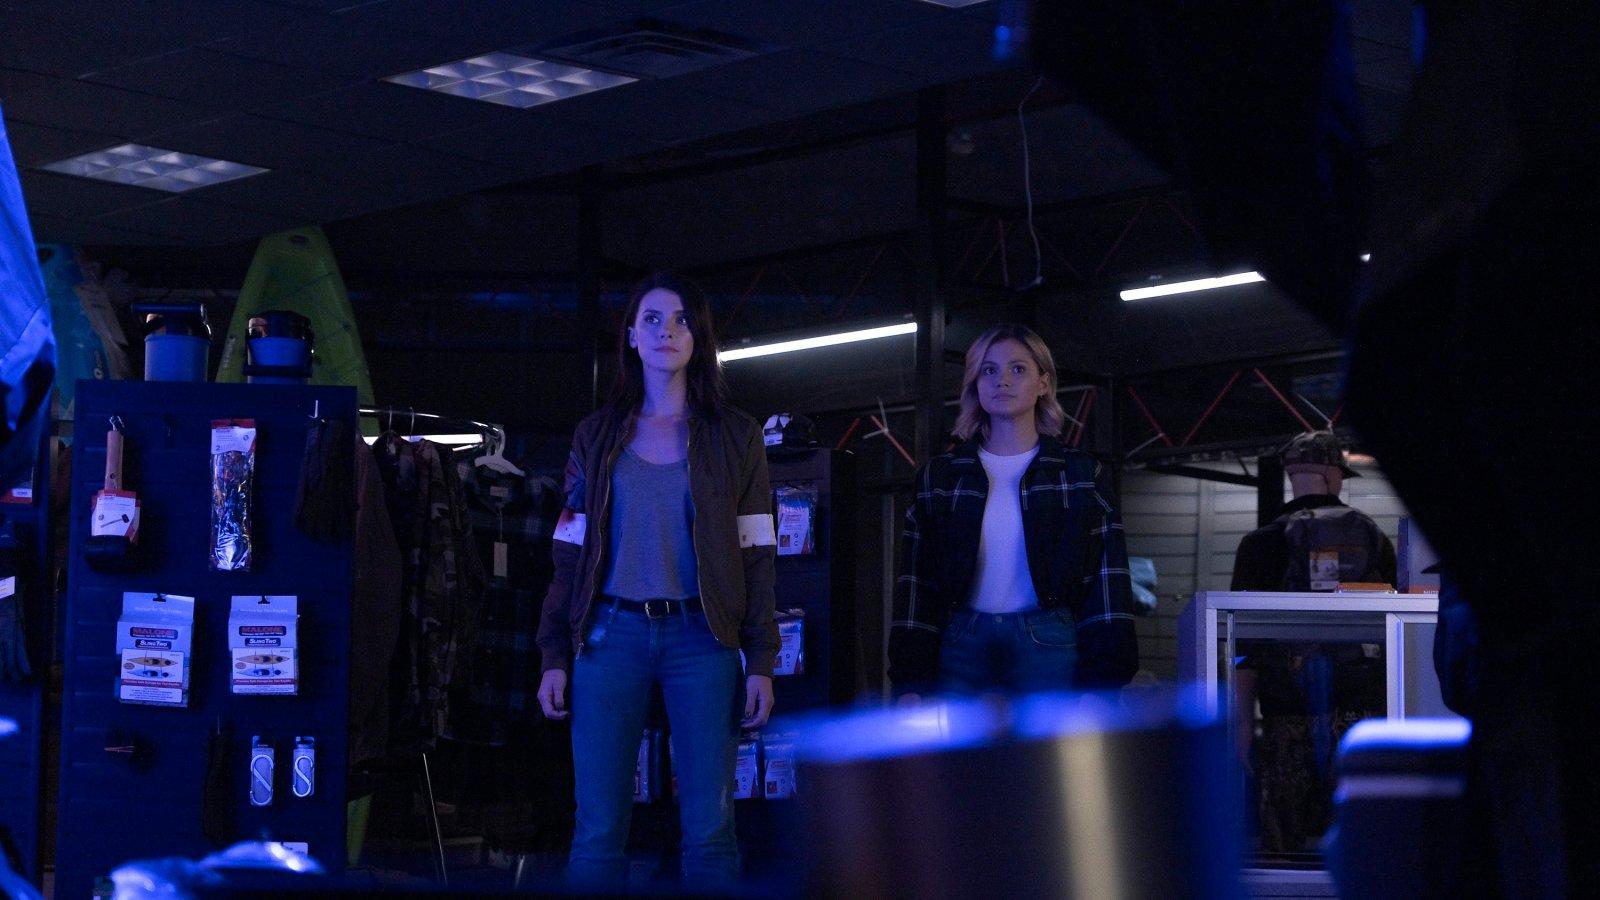 Marvel's Cloak & Dagger Season 2 Episode 4